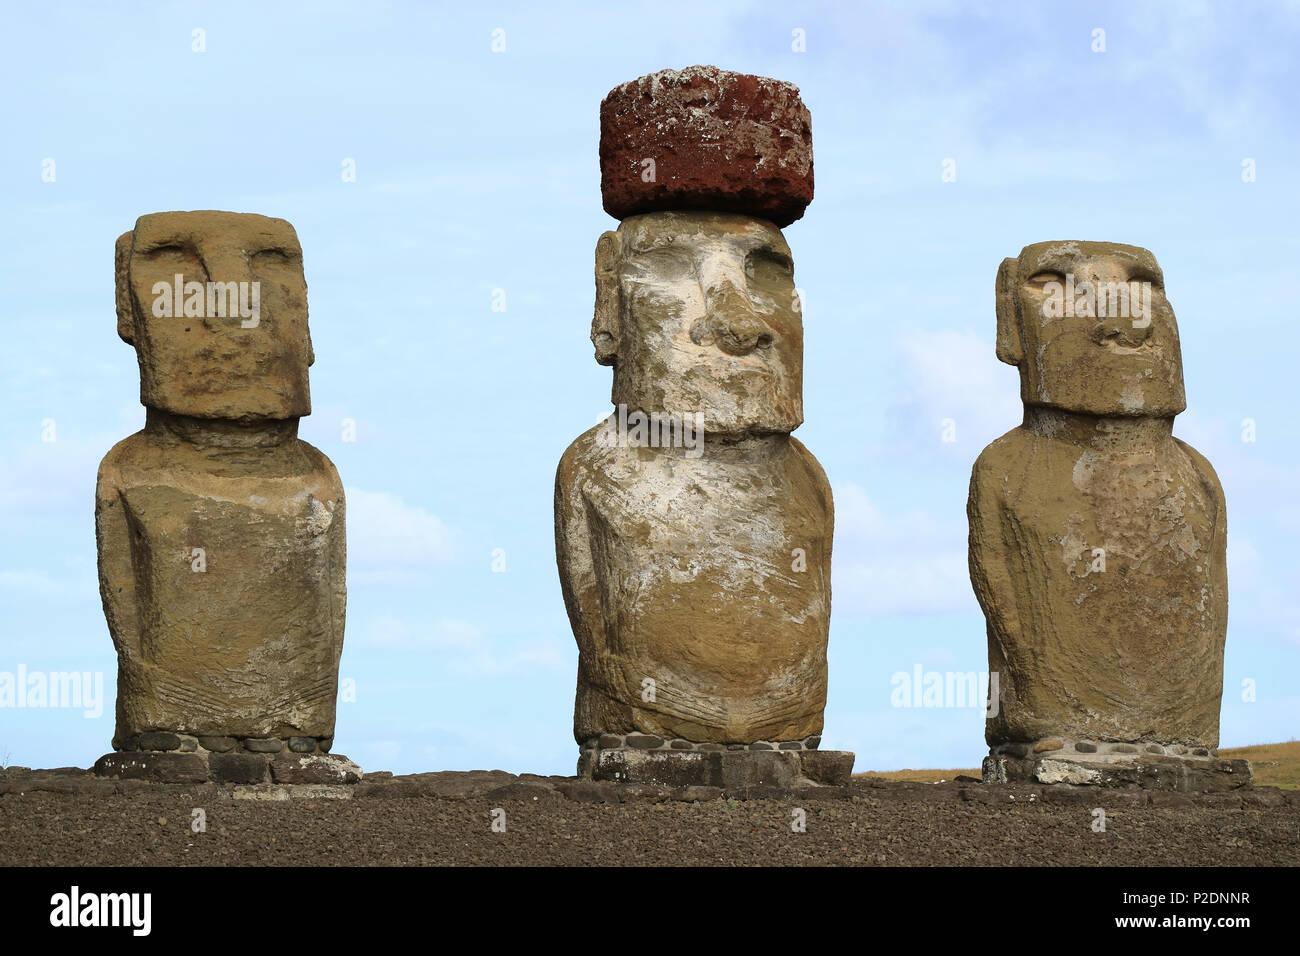 Tres de los quince enormes estatuas moai de Ahu Tongariki en la Isla de Pascua, Chile, Sudamérica Imagen De Stock